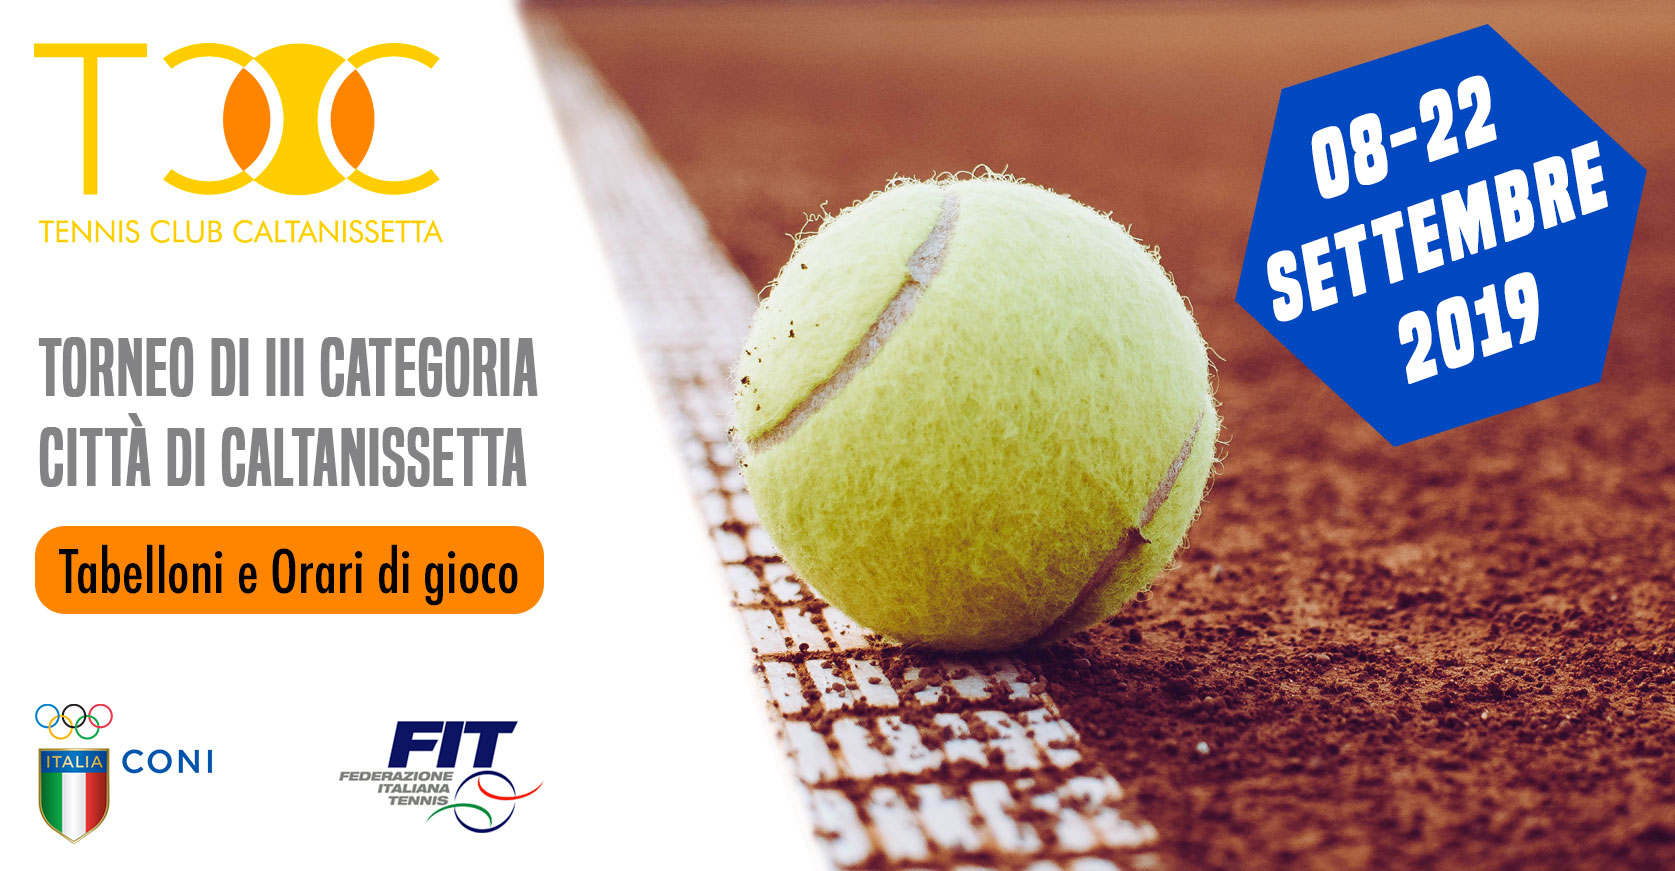 Torneo-III-Categoria-Tabelloni-Orari